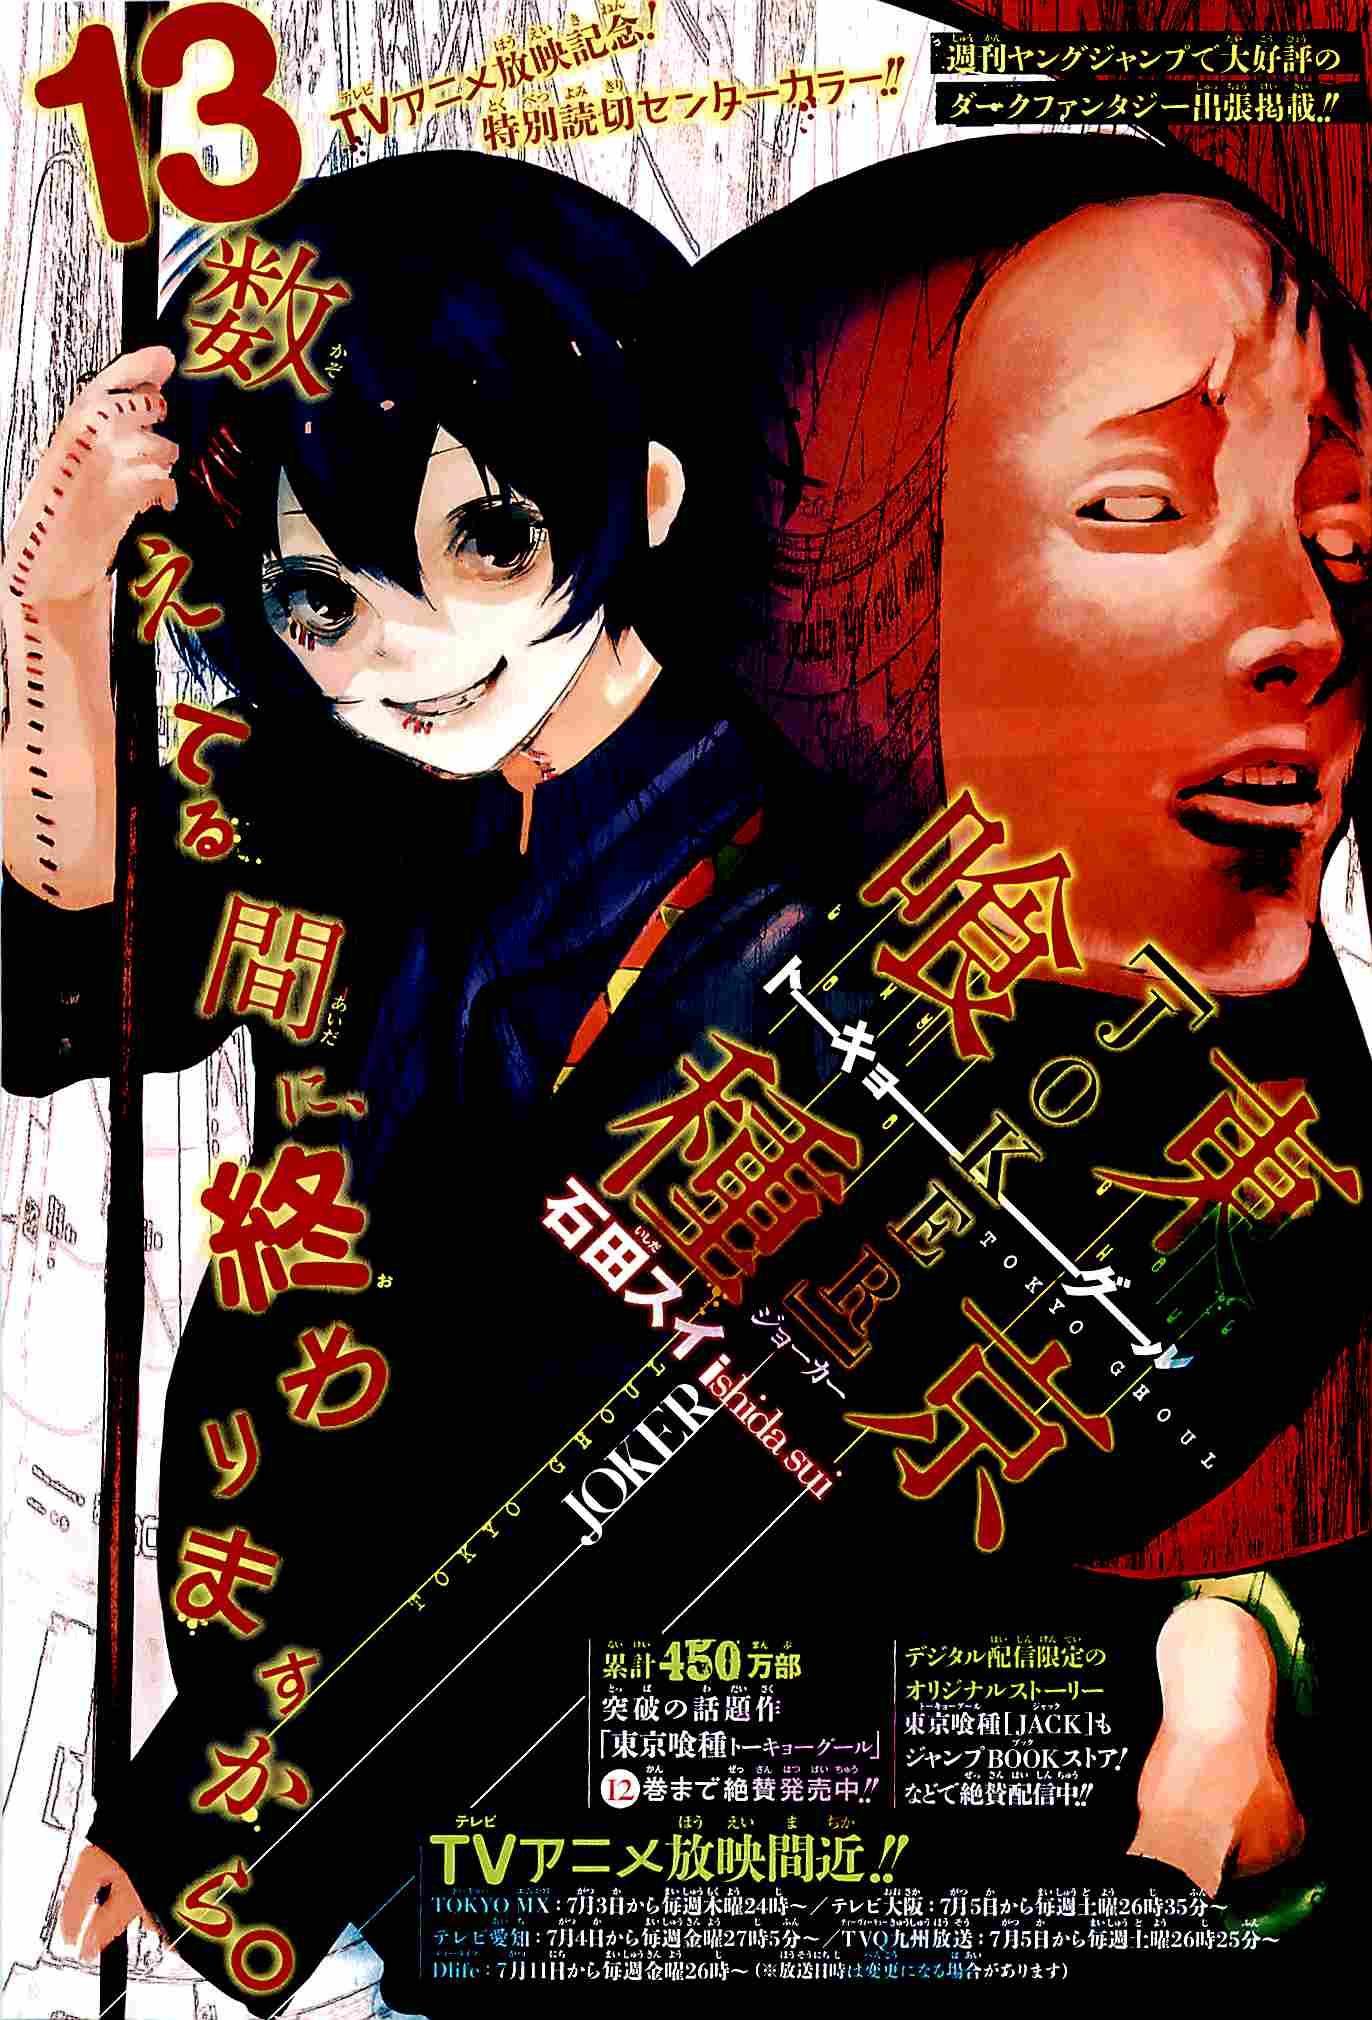 Storia parallela: Joker